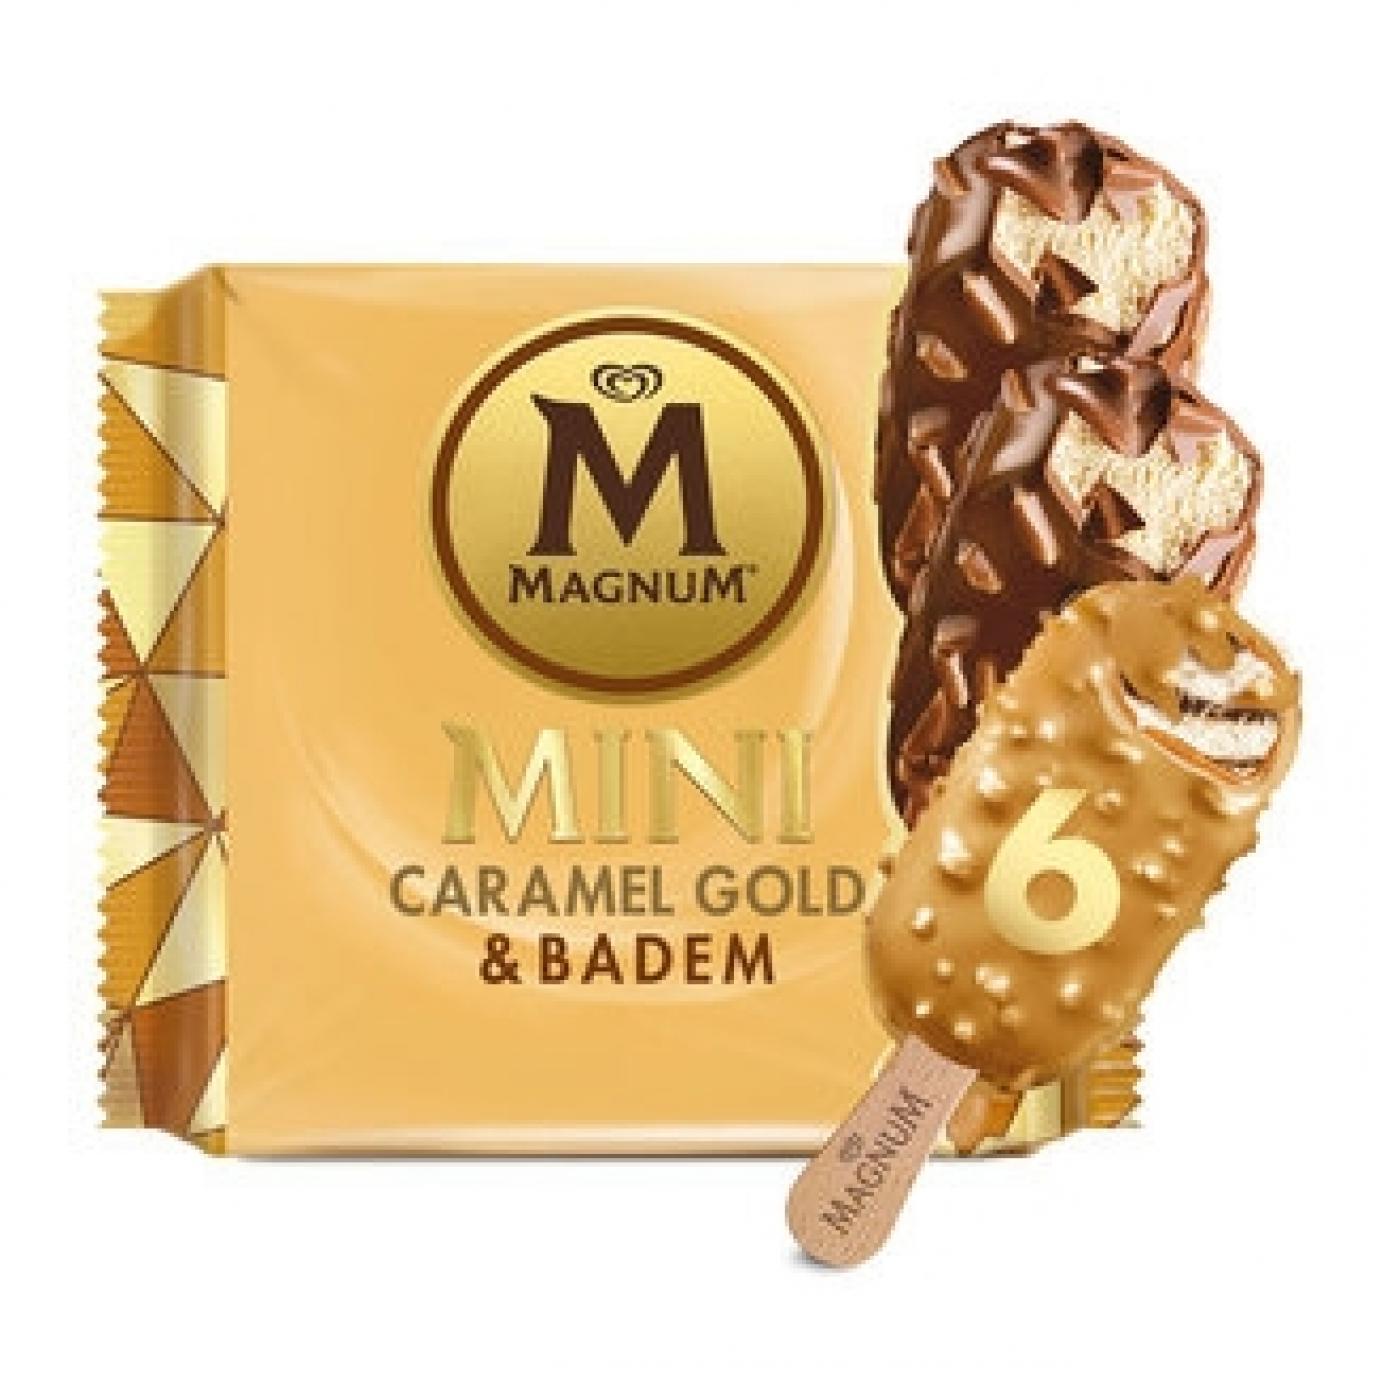 ALGİDA 345ML MAGNUM MİNİ BADEM KARAMEL GOLD